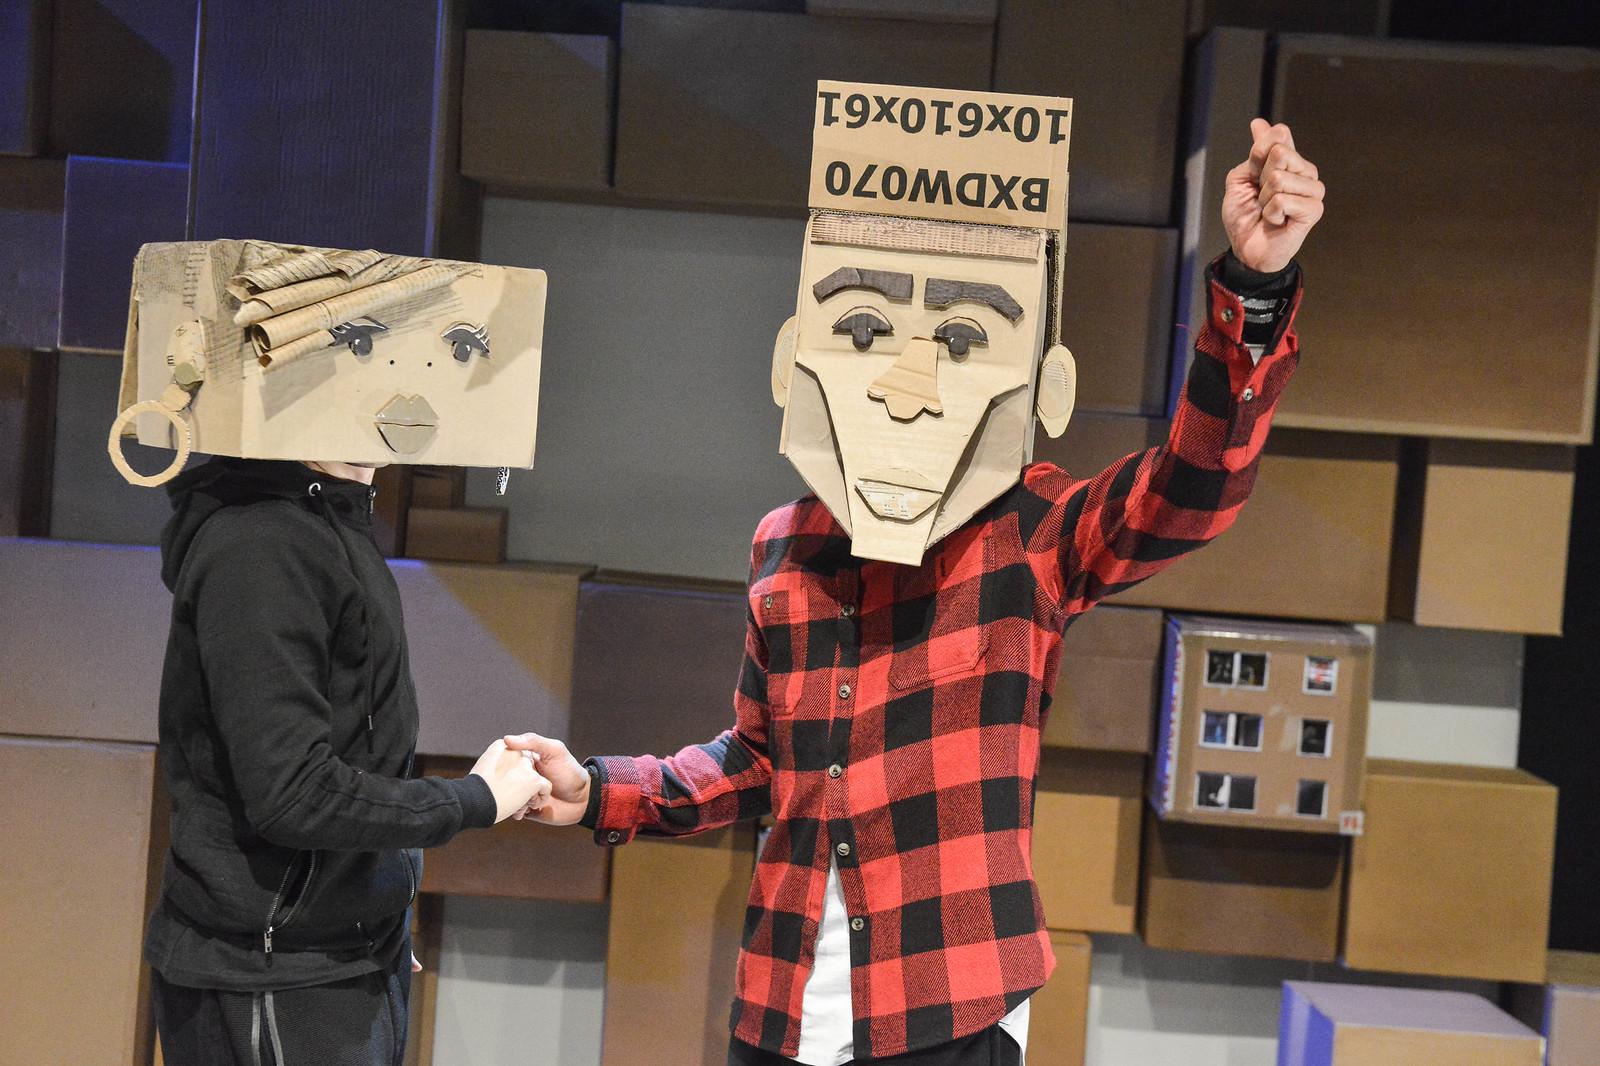 Two people wearing cardboard masks shake hands